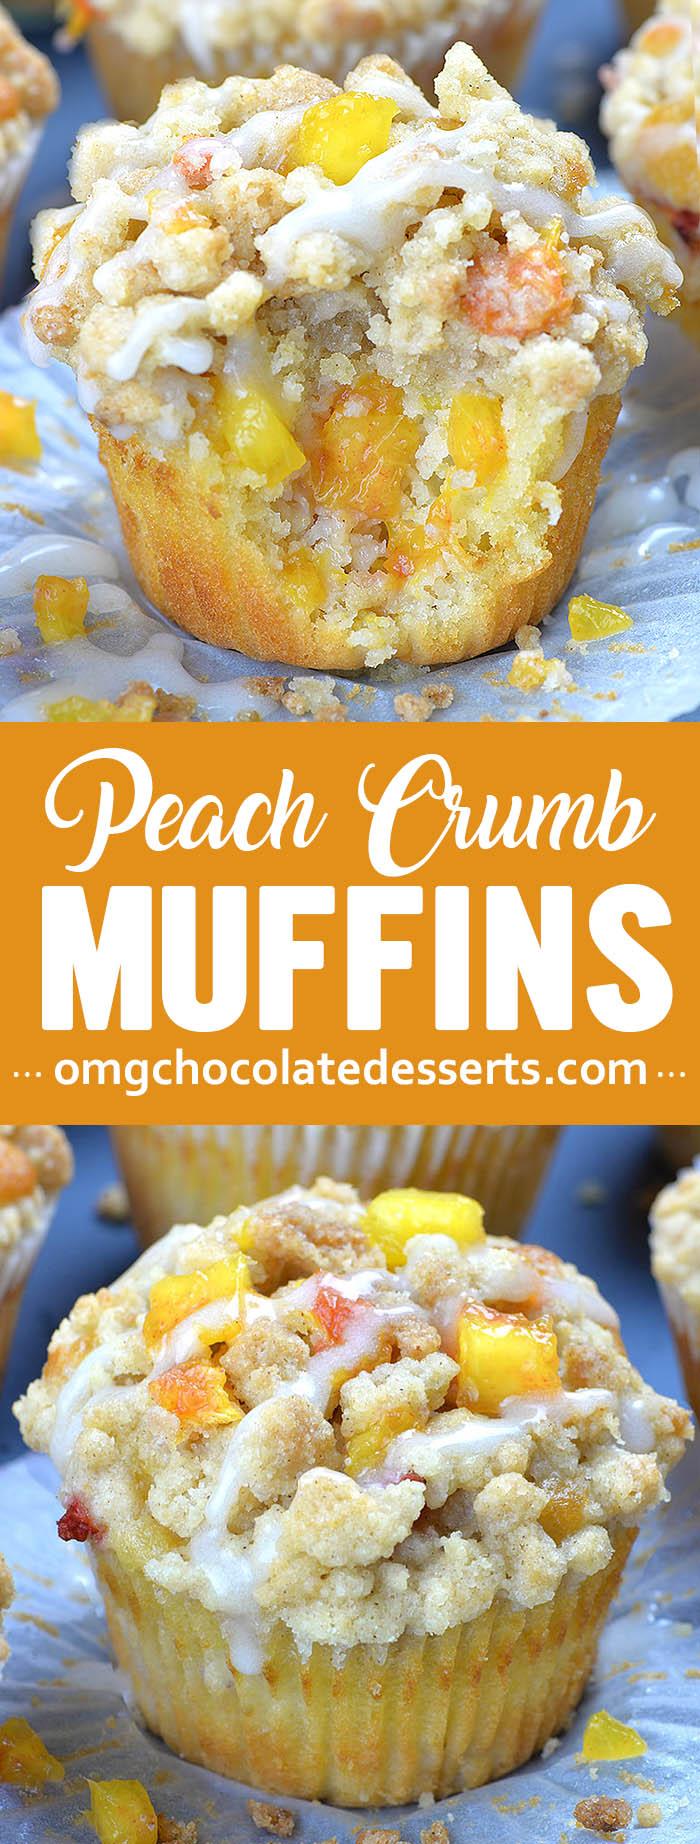 Photo of Peach Crumb Muffins